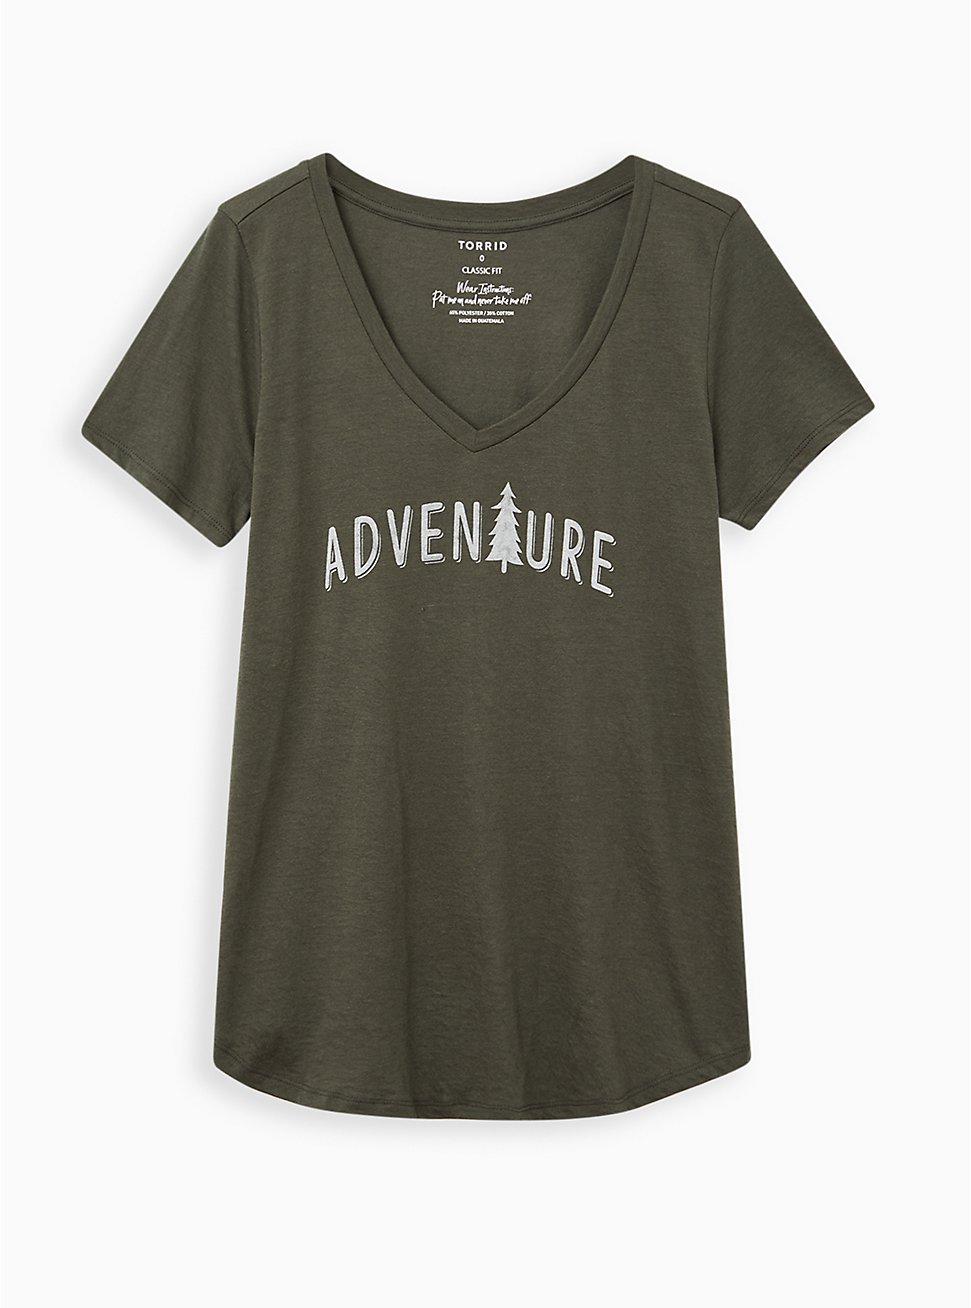 Girlfriend Tee – Signature Jersey Adventure Olive, DEEP DEPTHS, hi-res